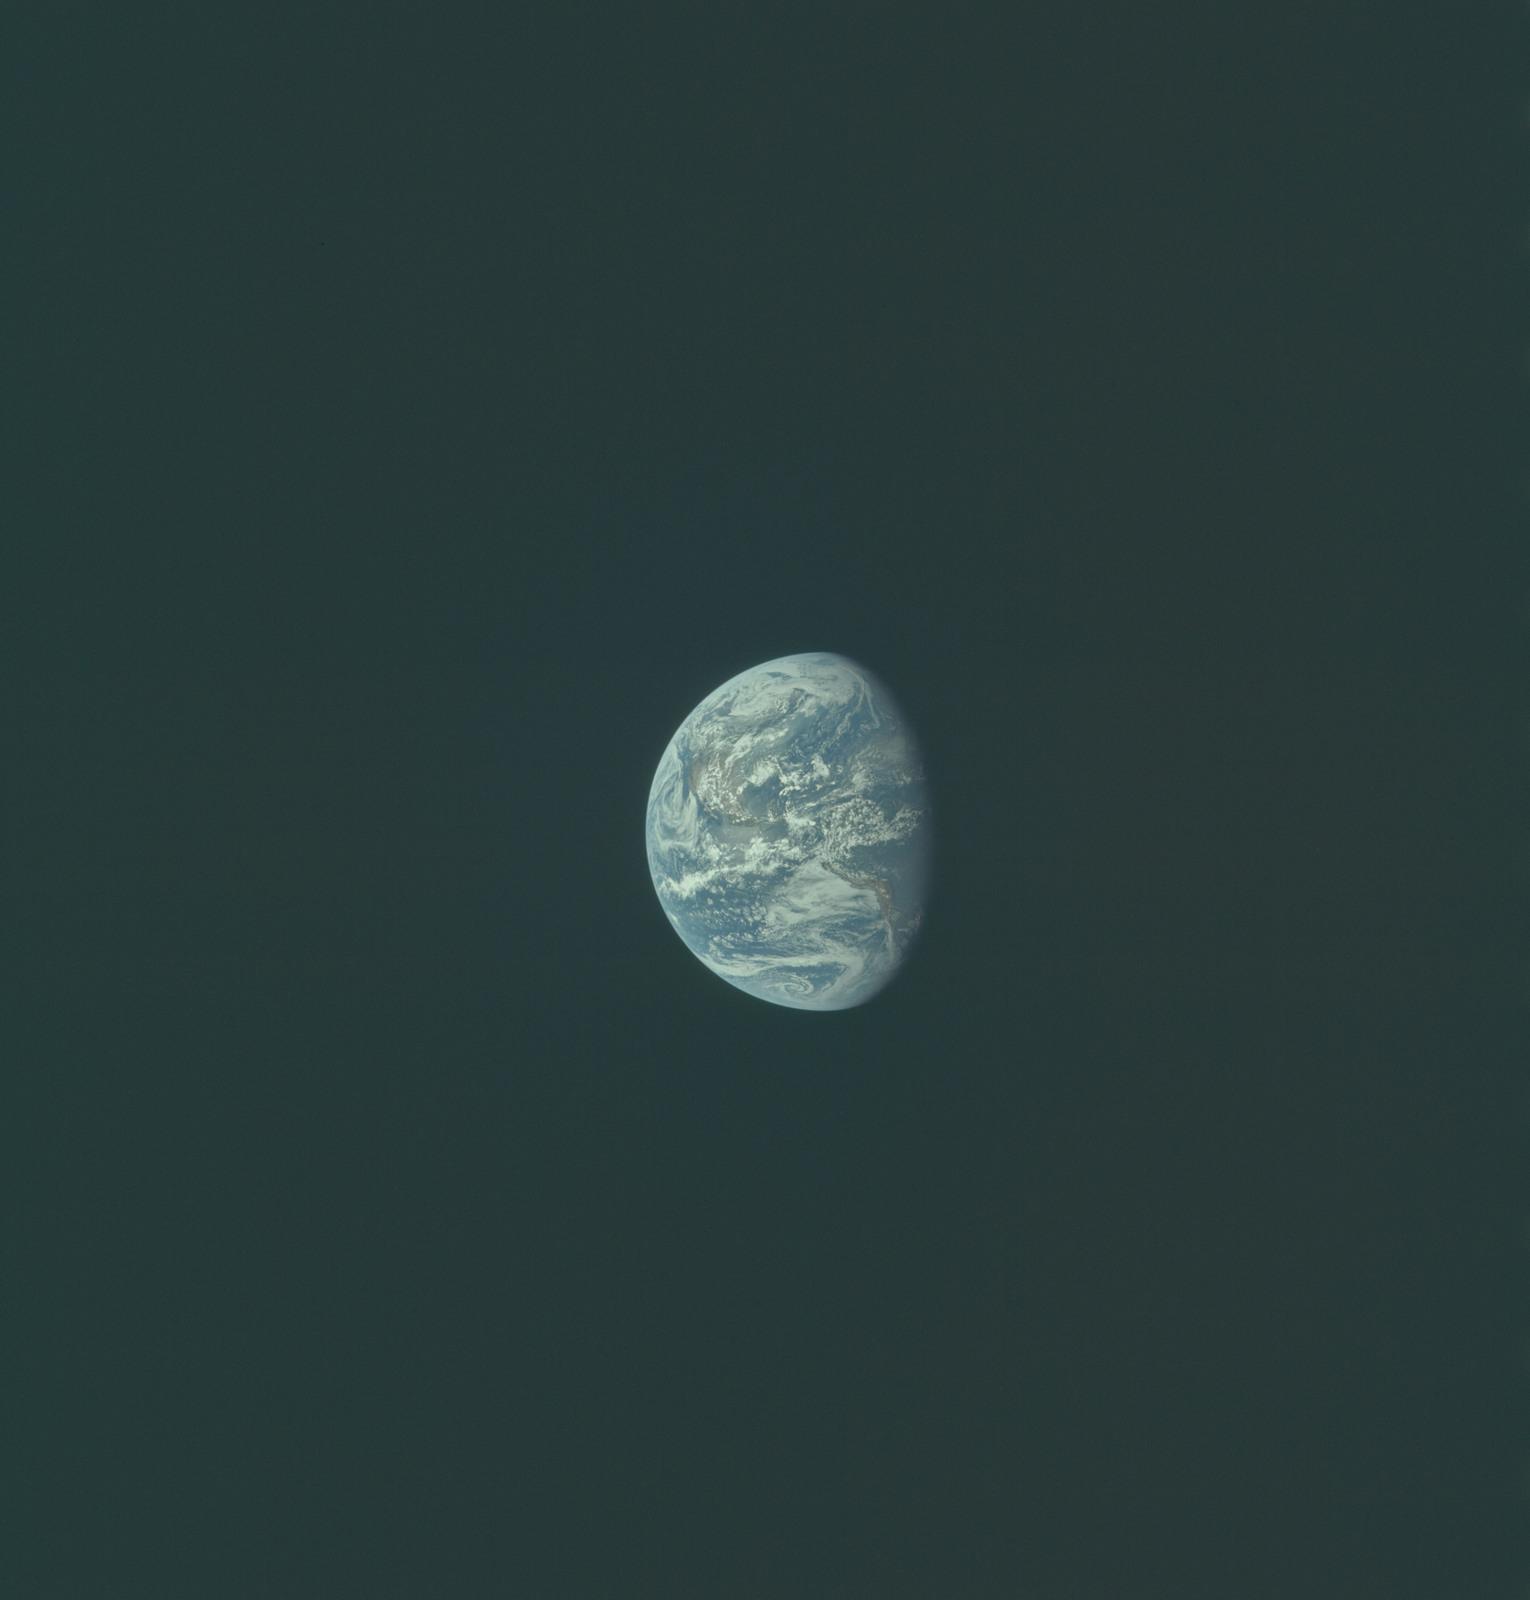 AS11-36-5367 - Apollo 11 - Apollo 11 Mission image - Earth view over North and South America